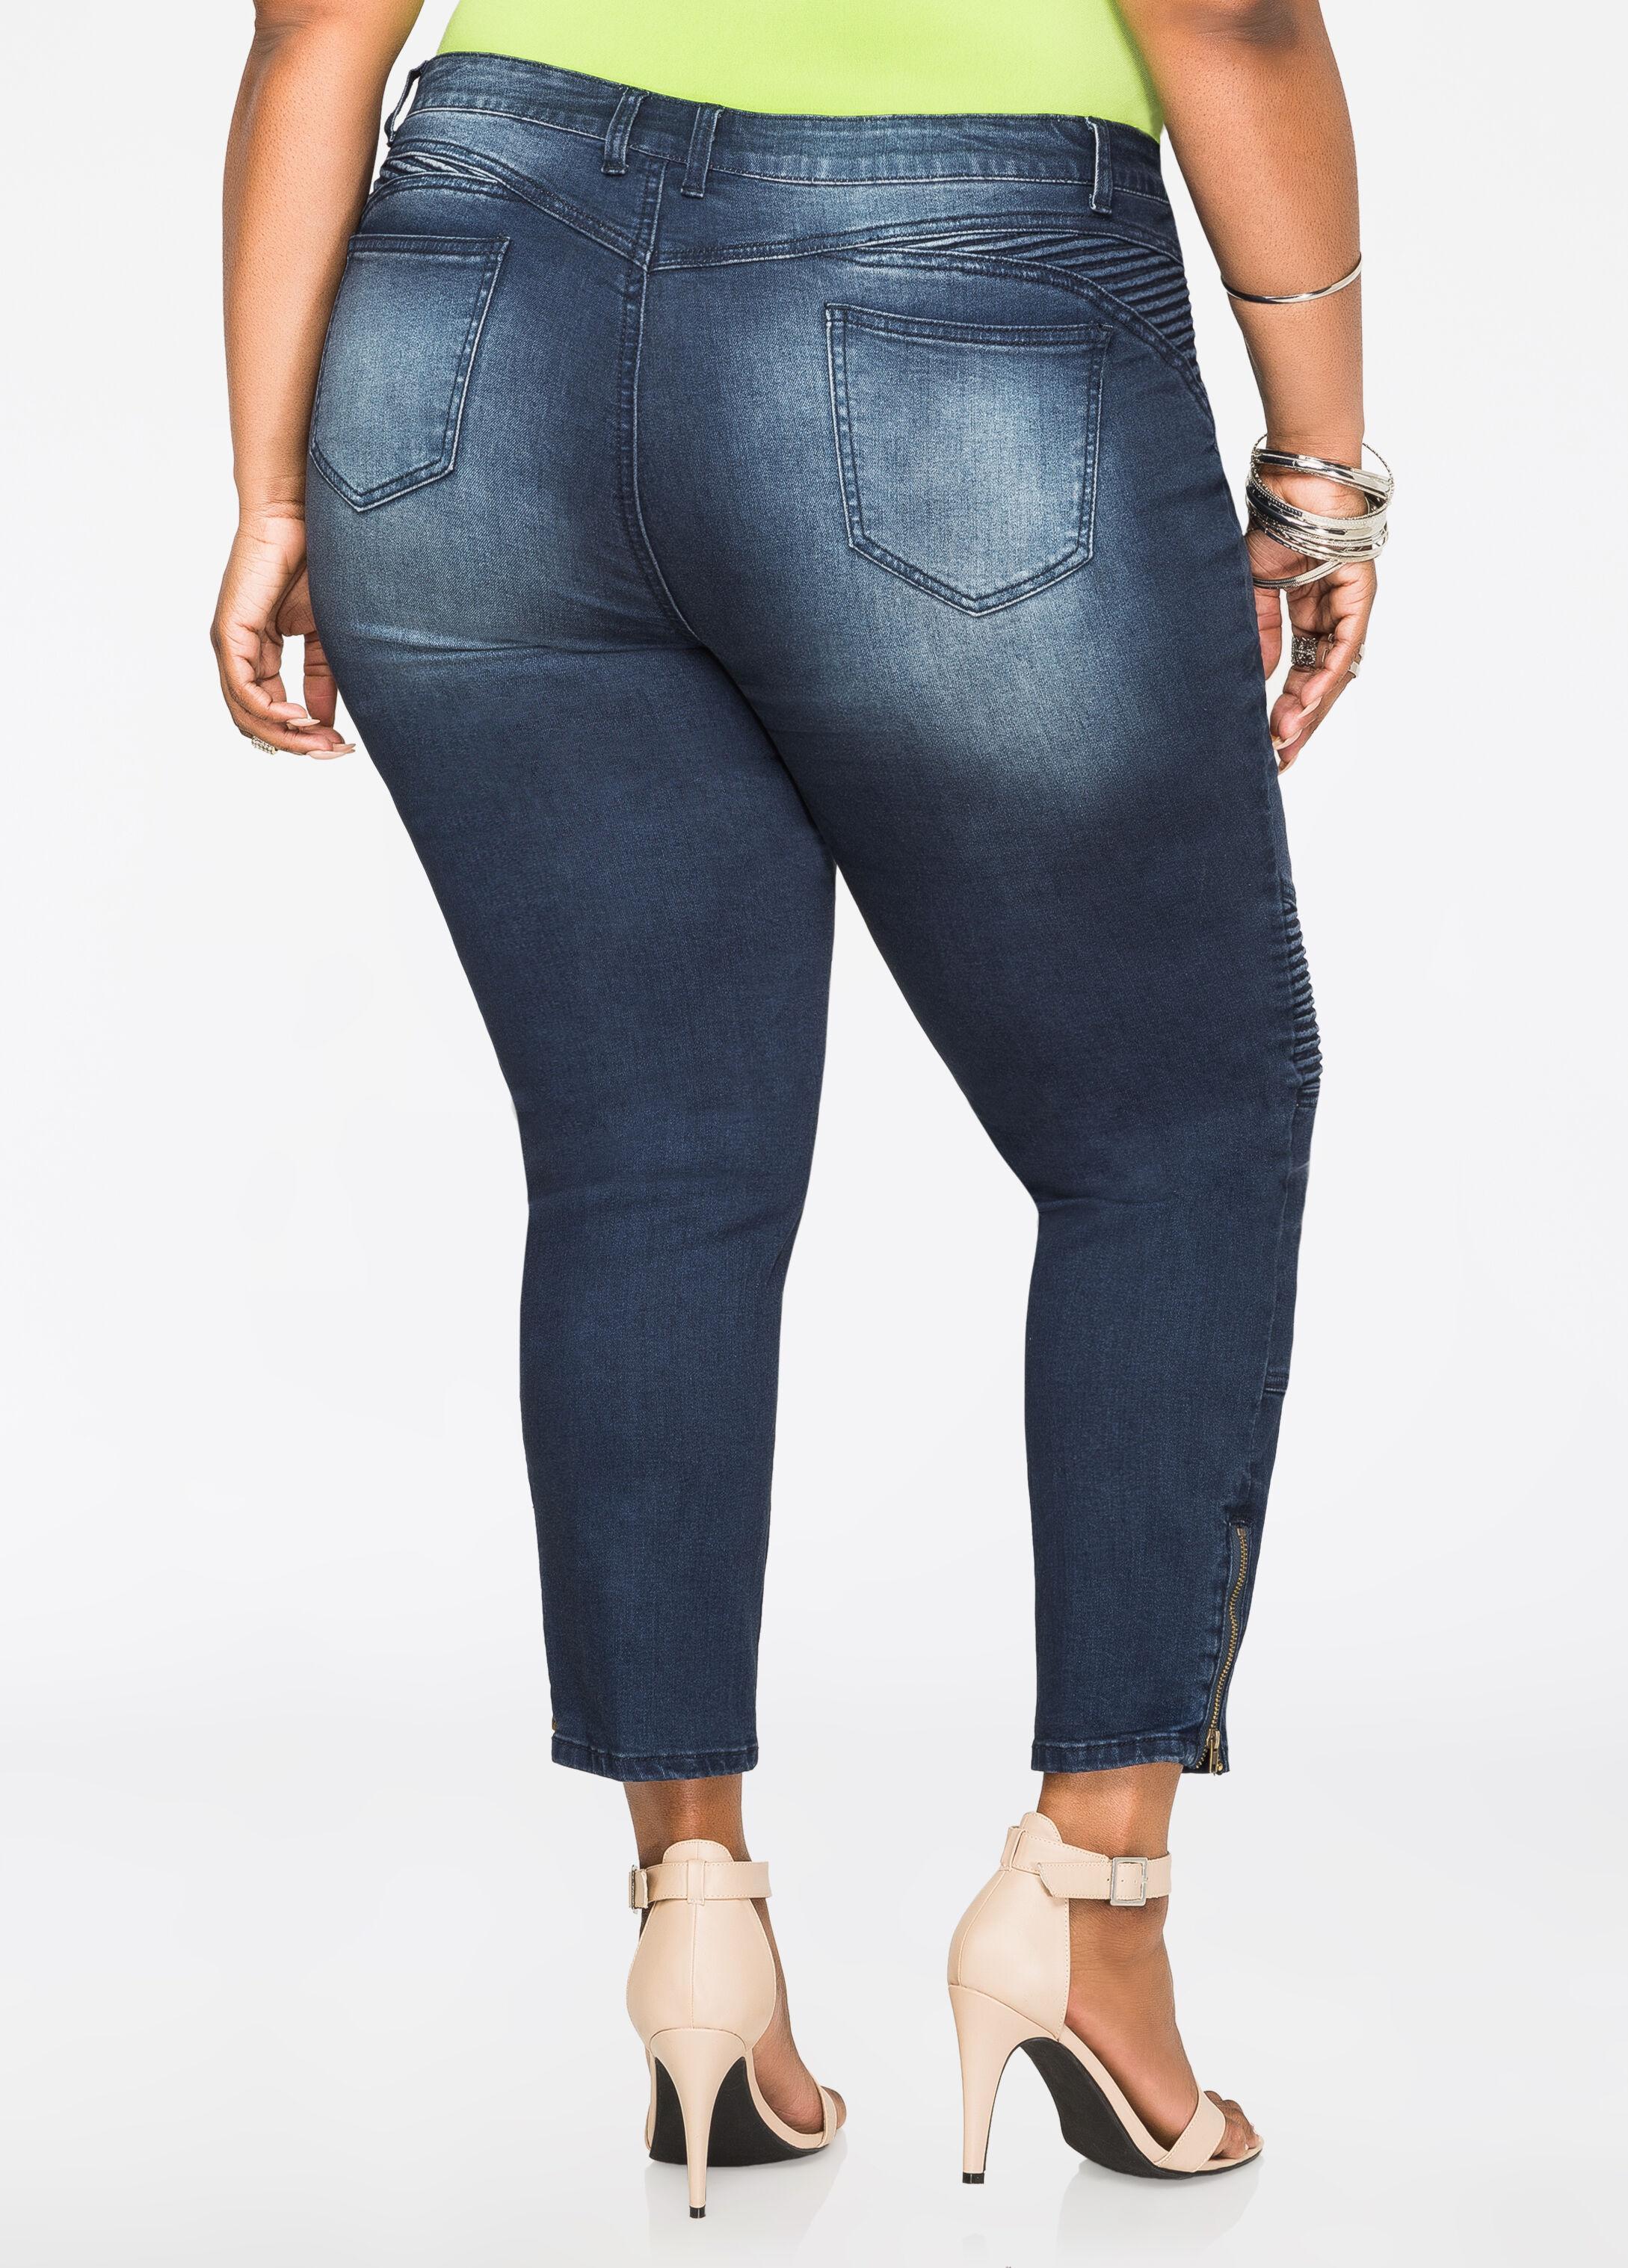 Moto Zip Ankle Jeans